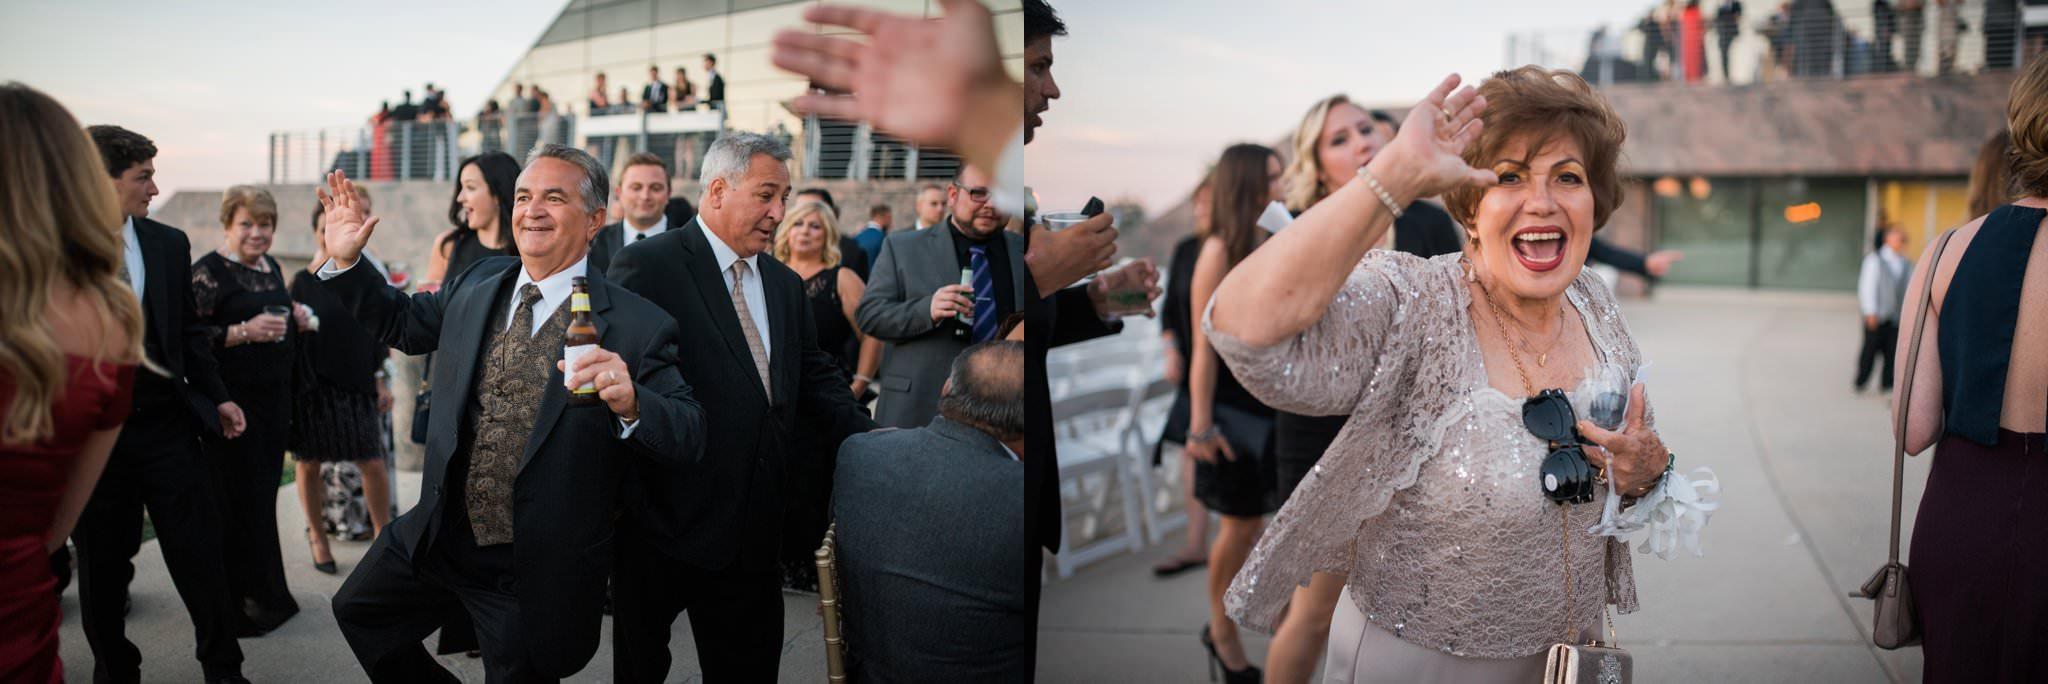 Adler-Planetarium-Chicago-Wedding-Photography-0078.JPG